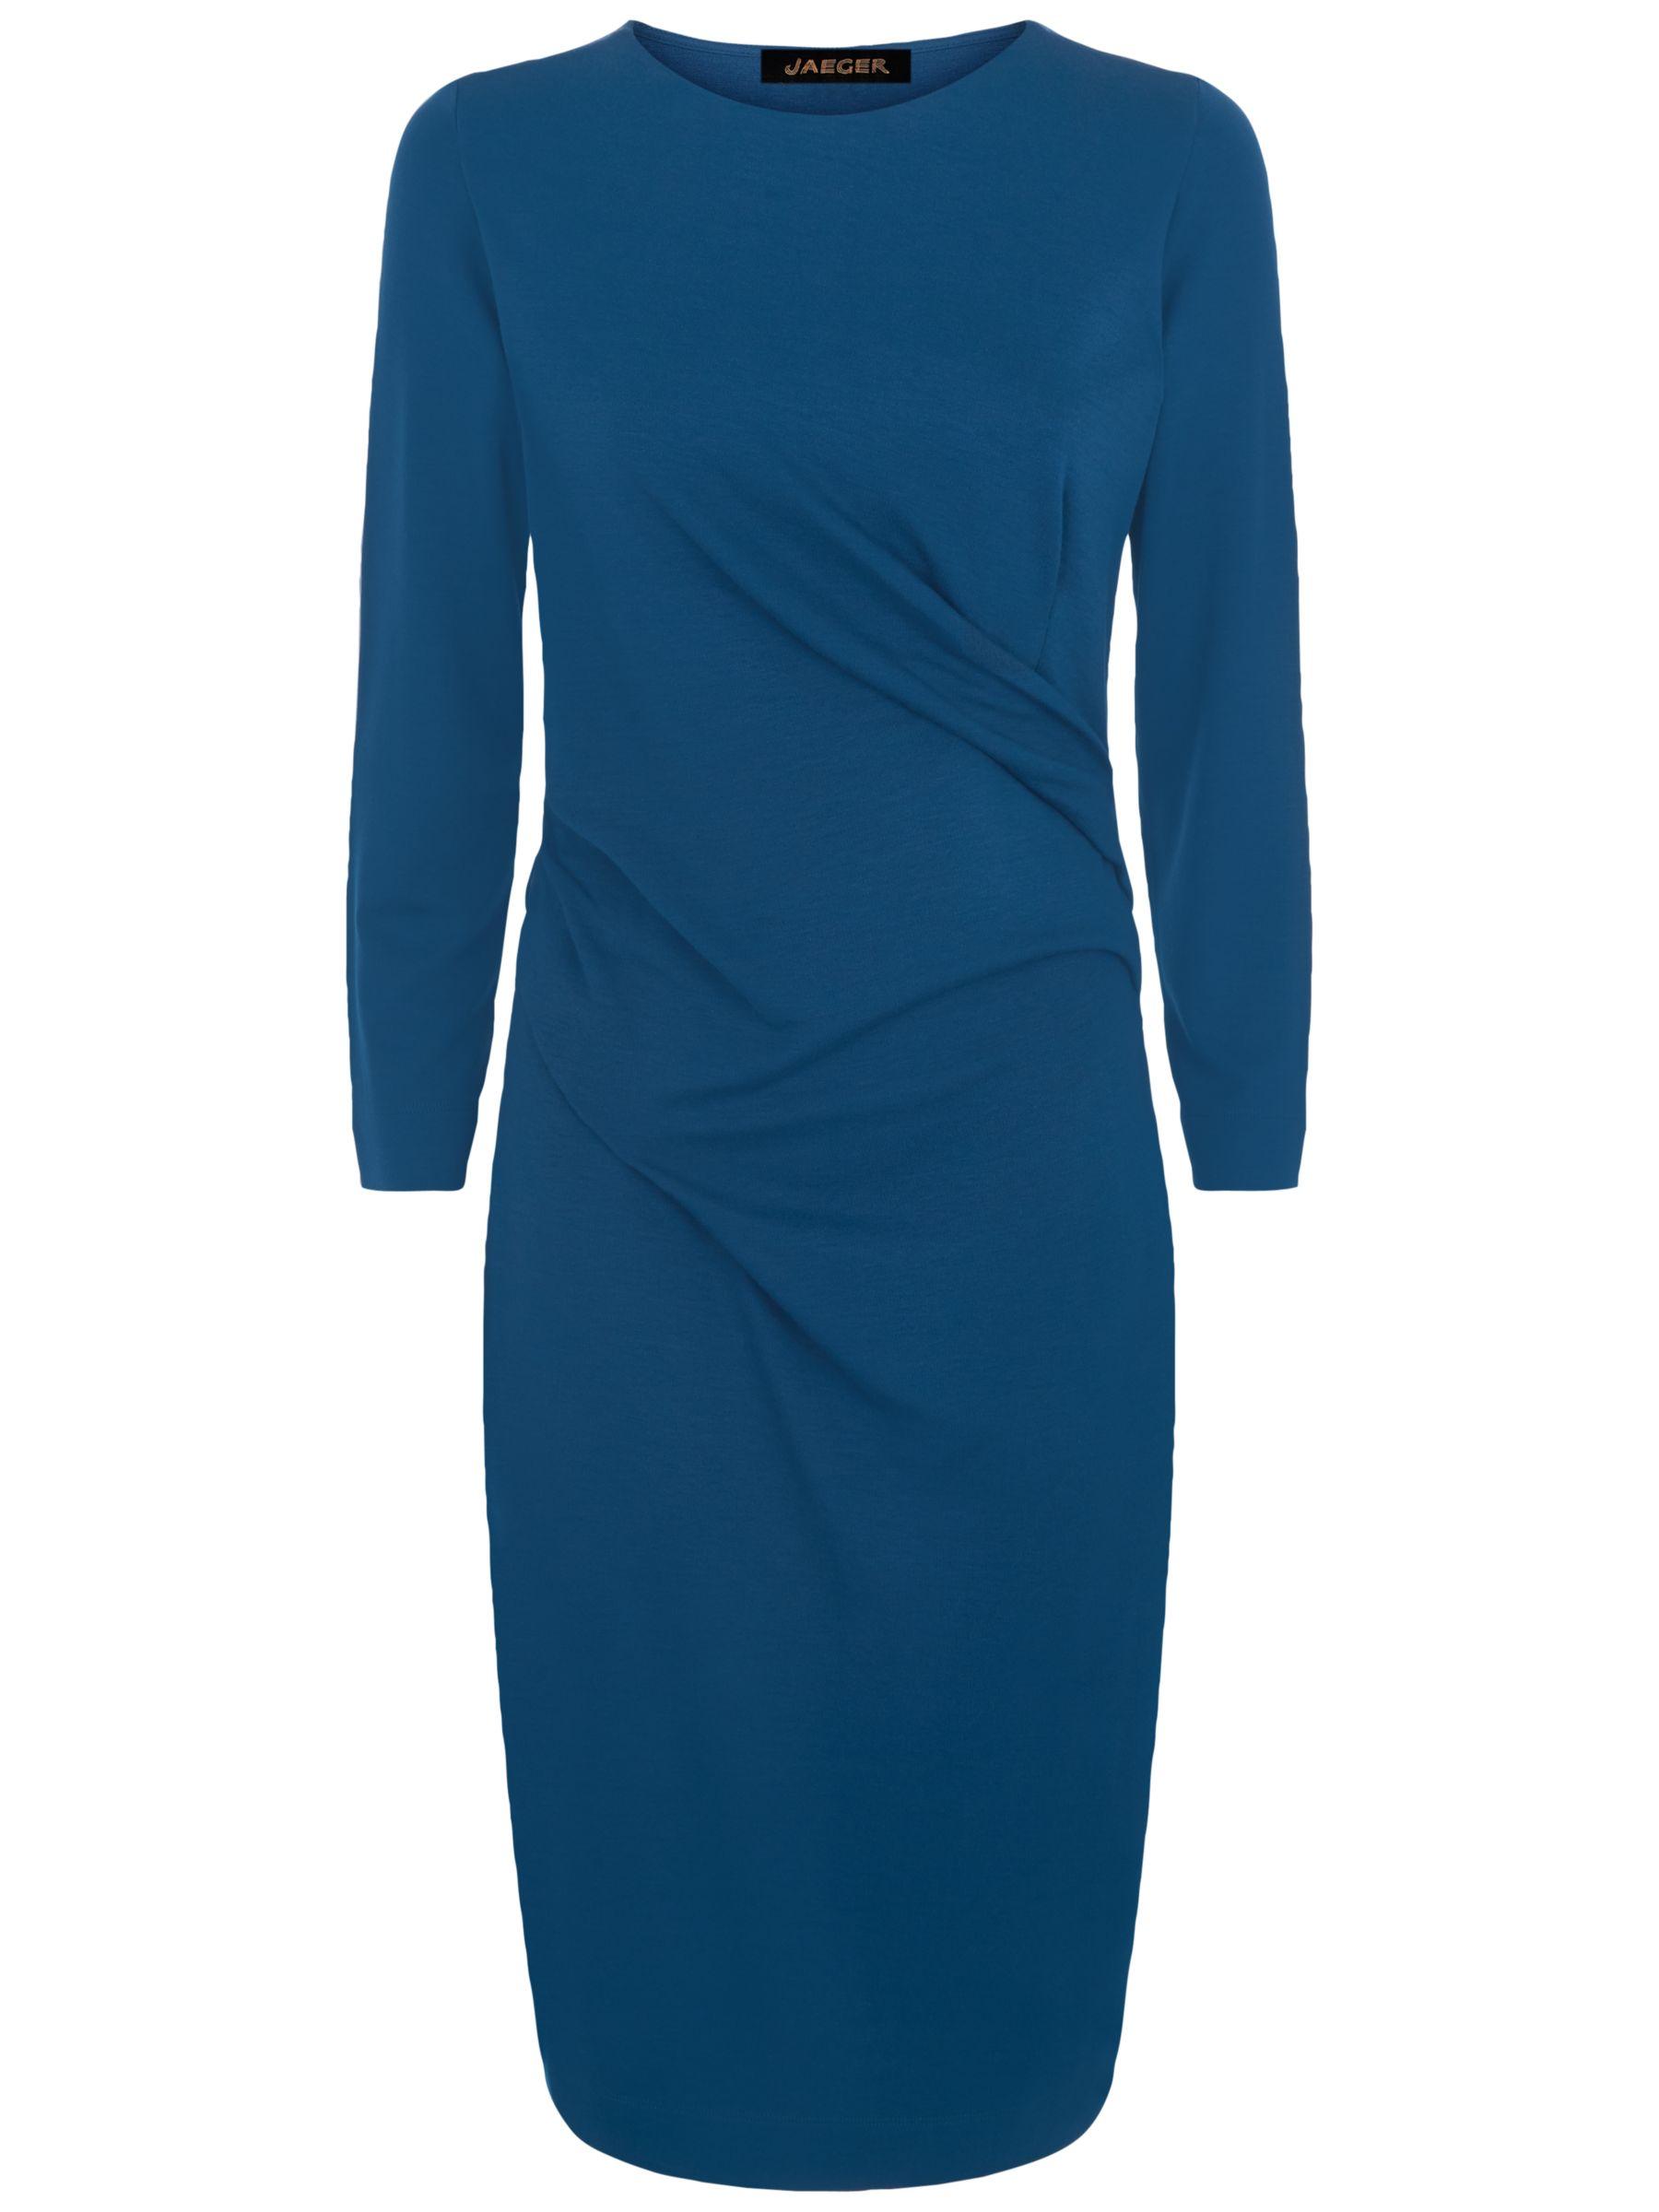 Jaeger Ponte Jersey Drape Dress Teal At John Lewis Partners